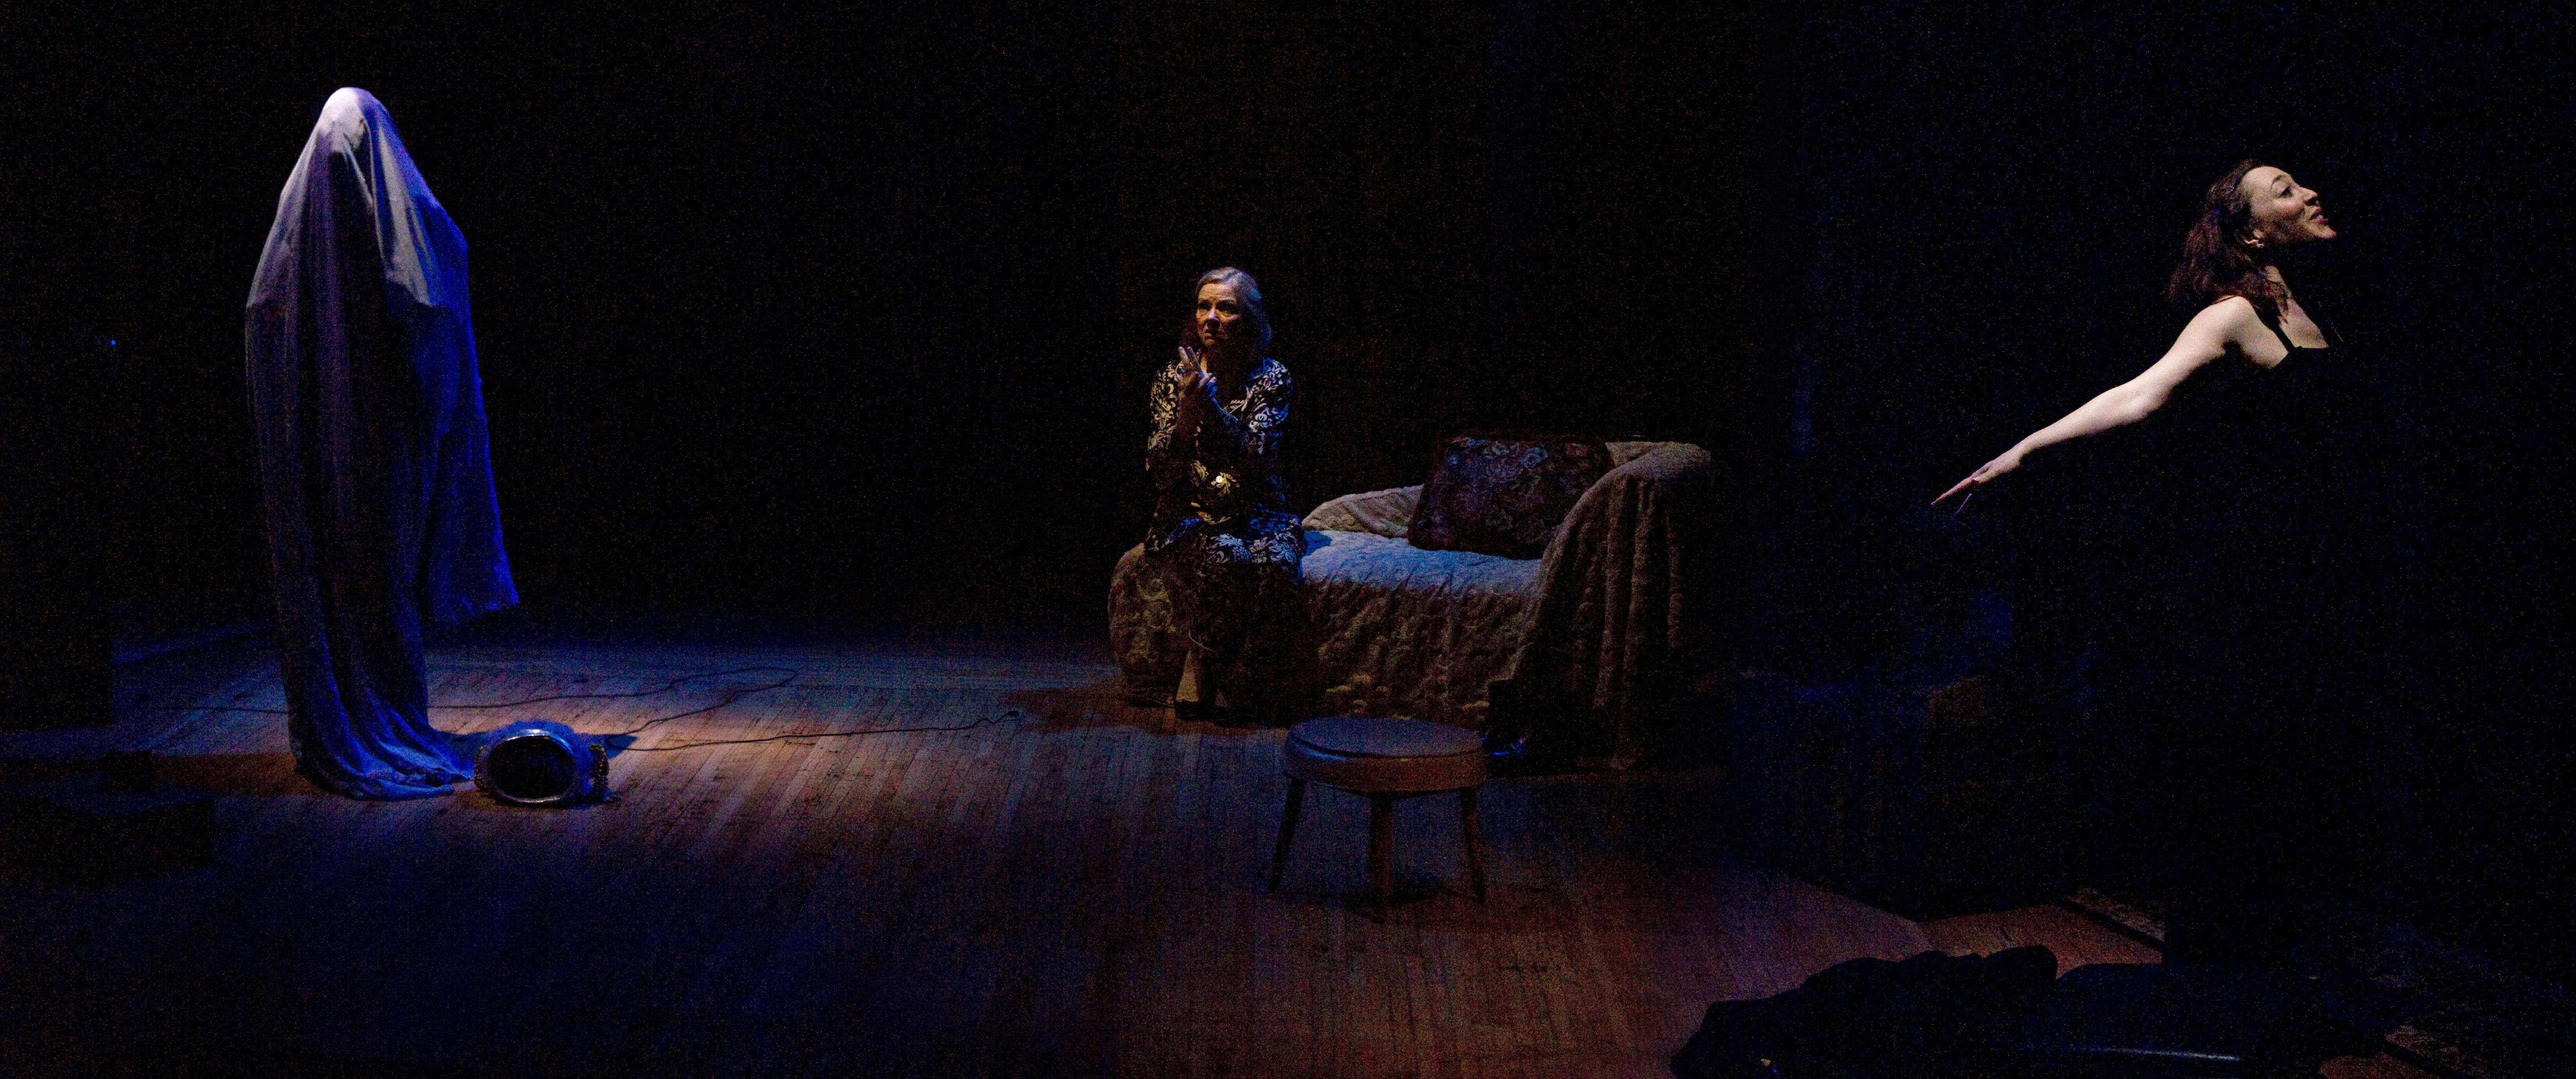 Insomnia by Holly Holsinger, Chris Seibert and Raymond Bobgan